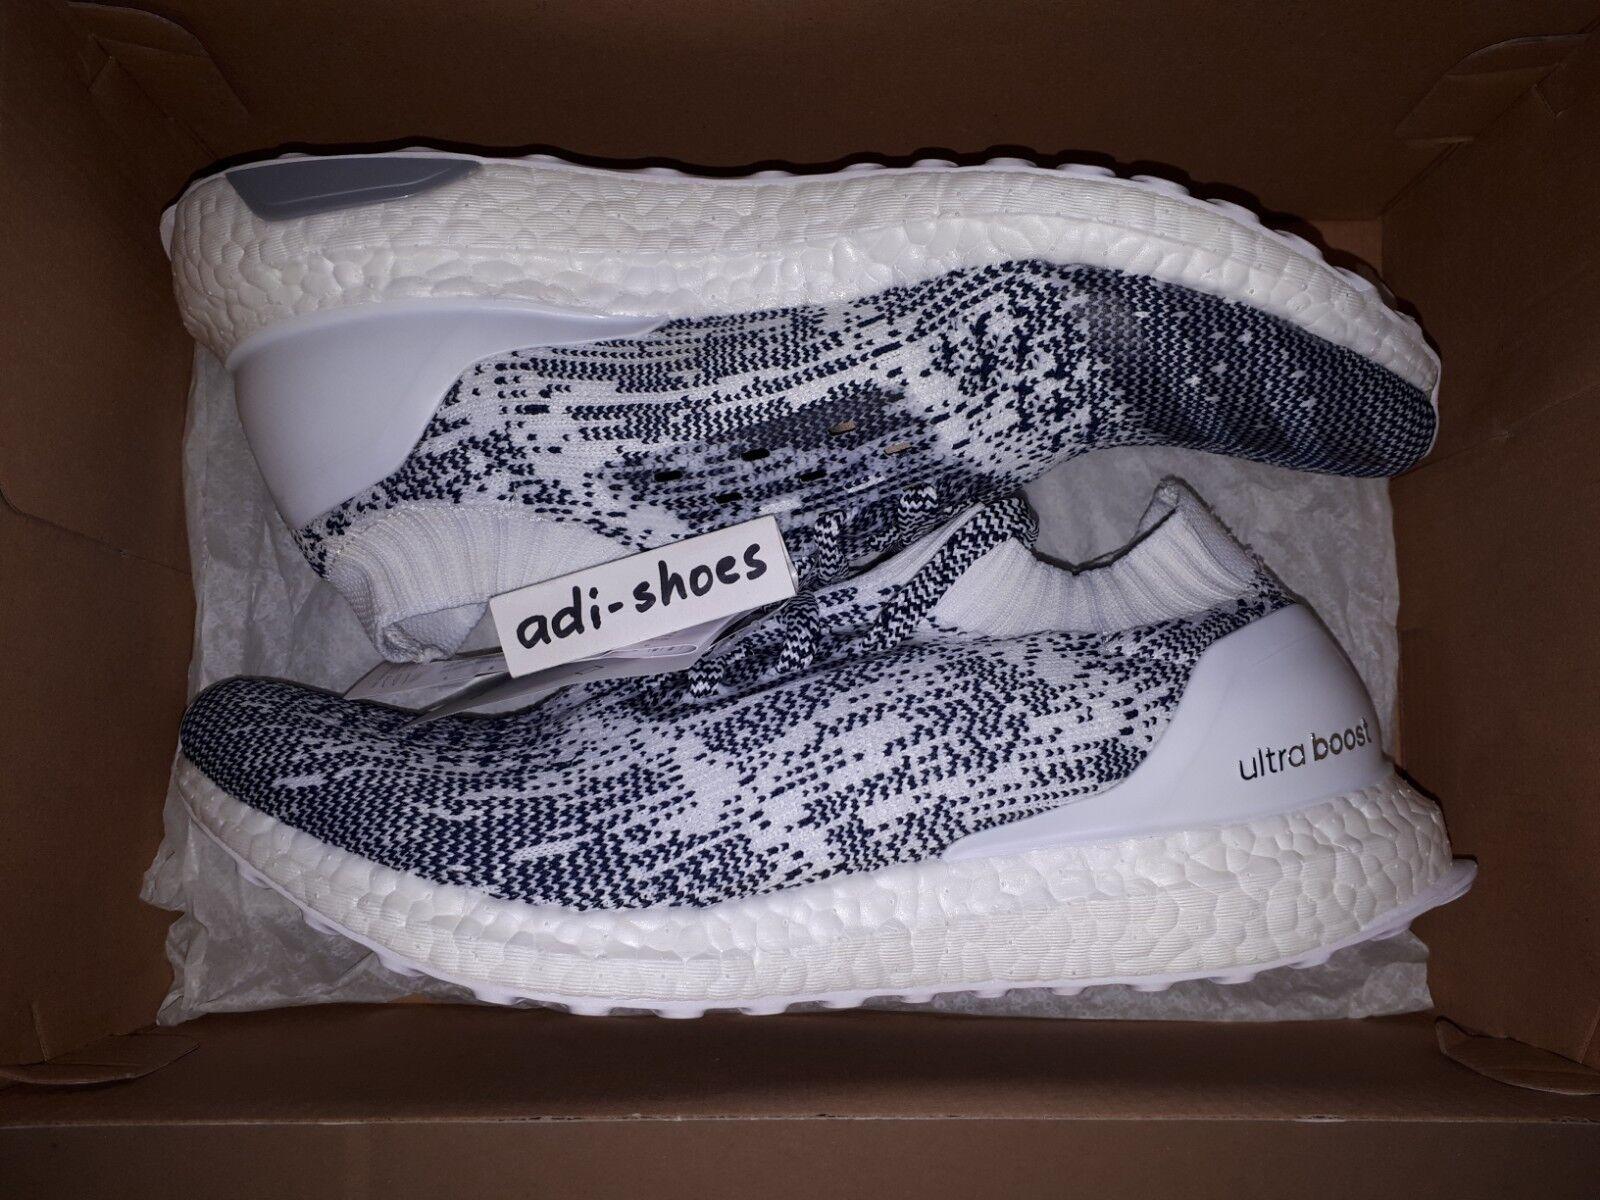 Adidas ultra Boost uncaged oreo expresen Blanco Ltd ba9616 Kolor expresen oreo Pure zg 8b405c